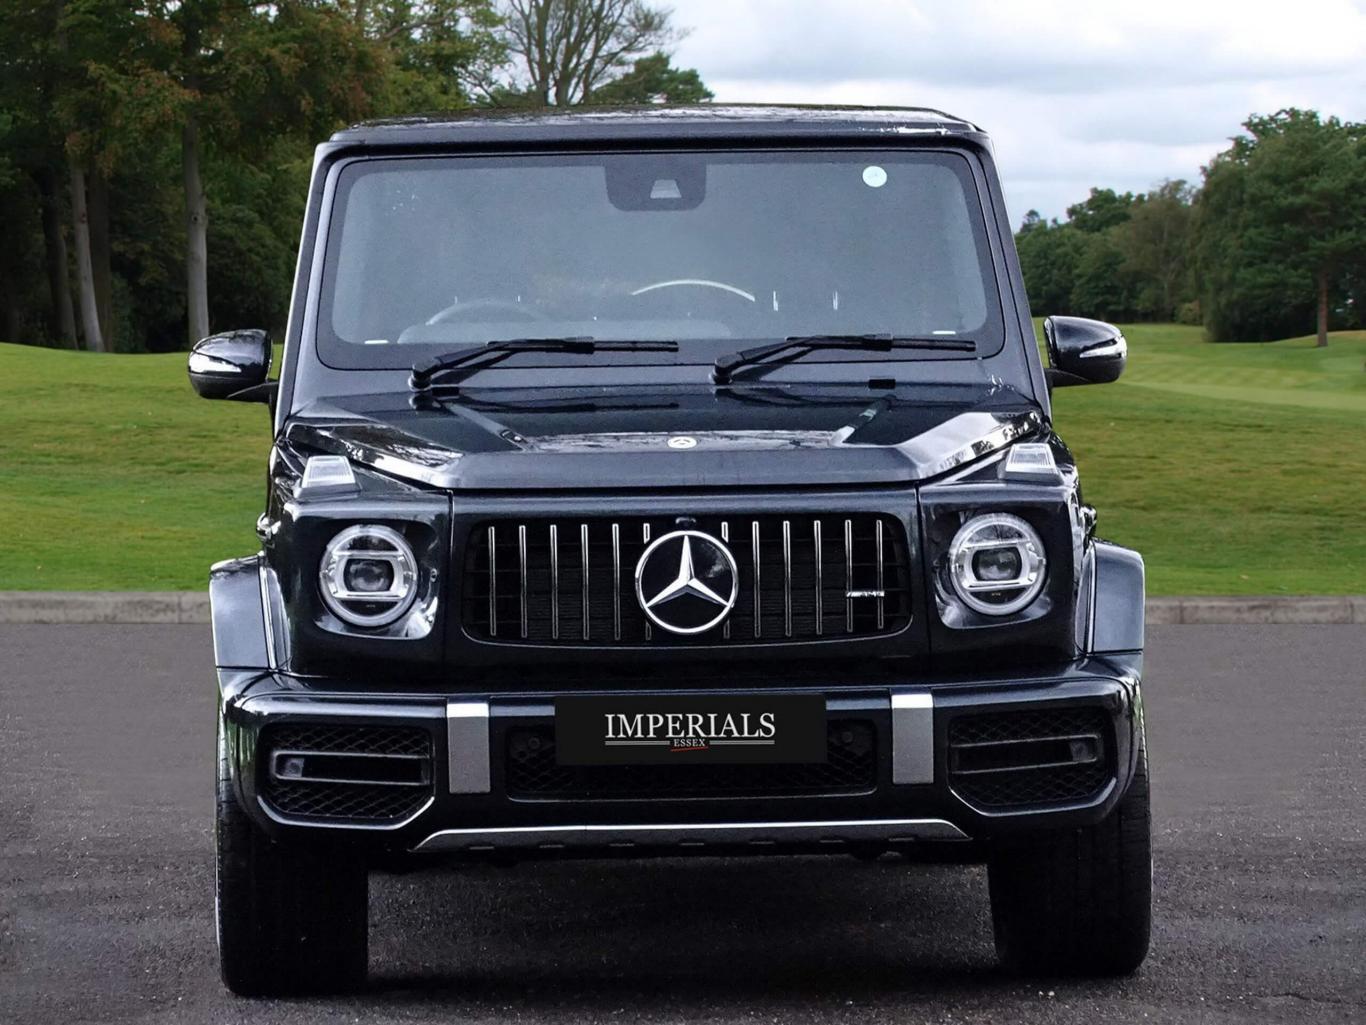 Mercedes New Model >> Mercedes Benz G63 Amg 40 V8 New 2019 Model 9 Speed 4x4 Magnetite Black Metallic Automatic Petrol